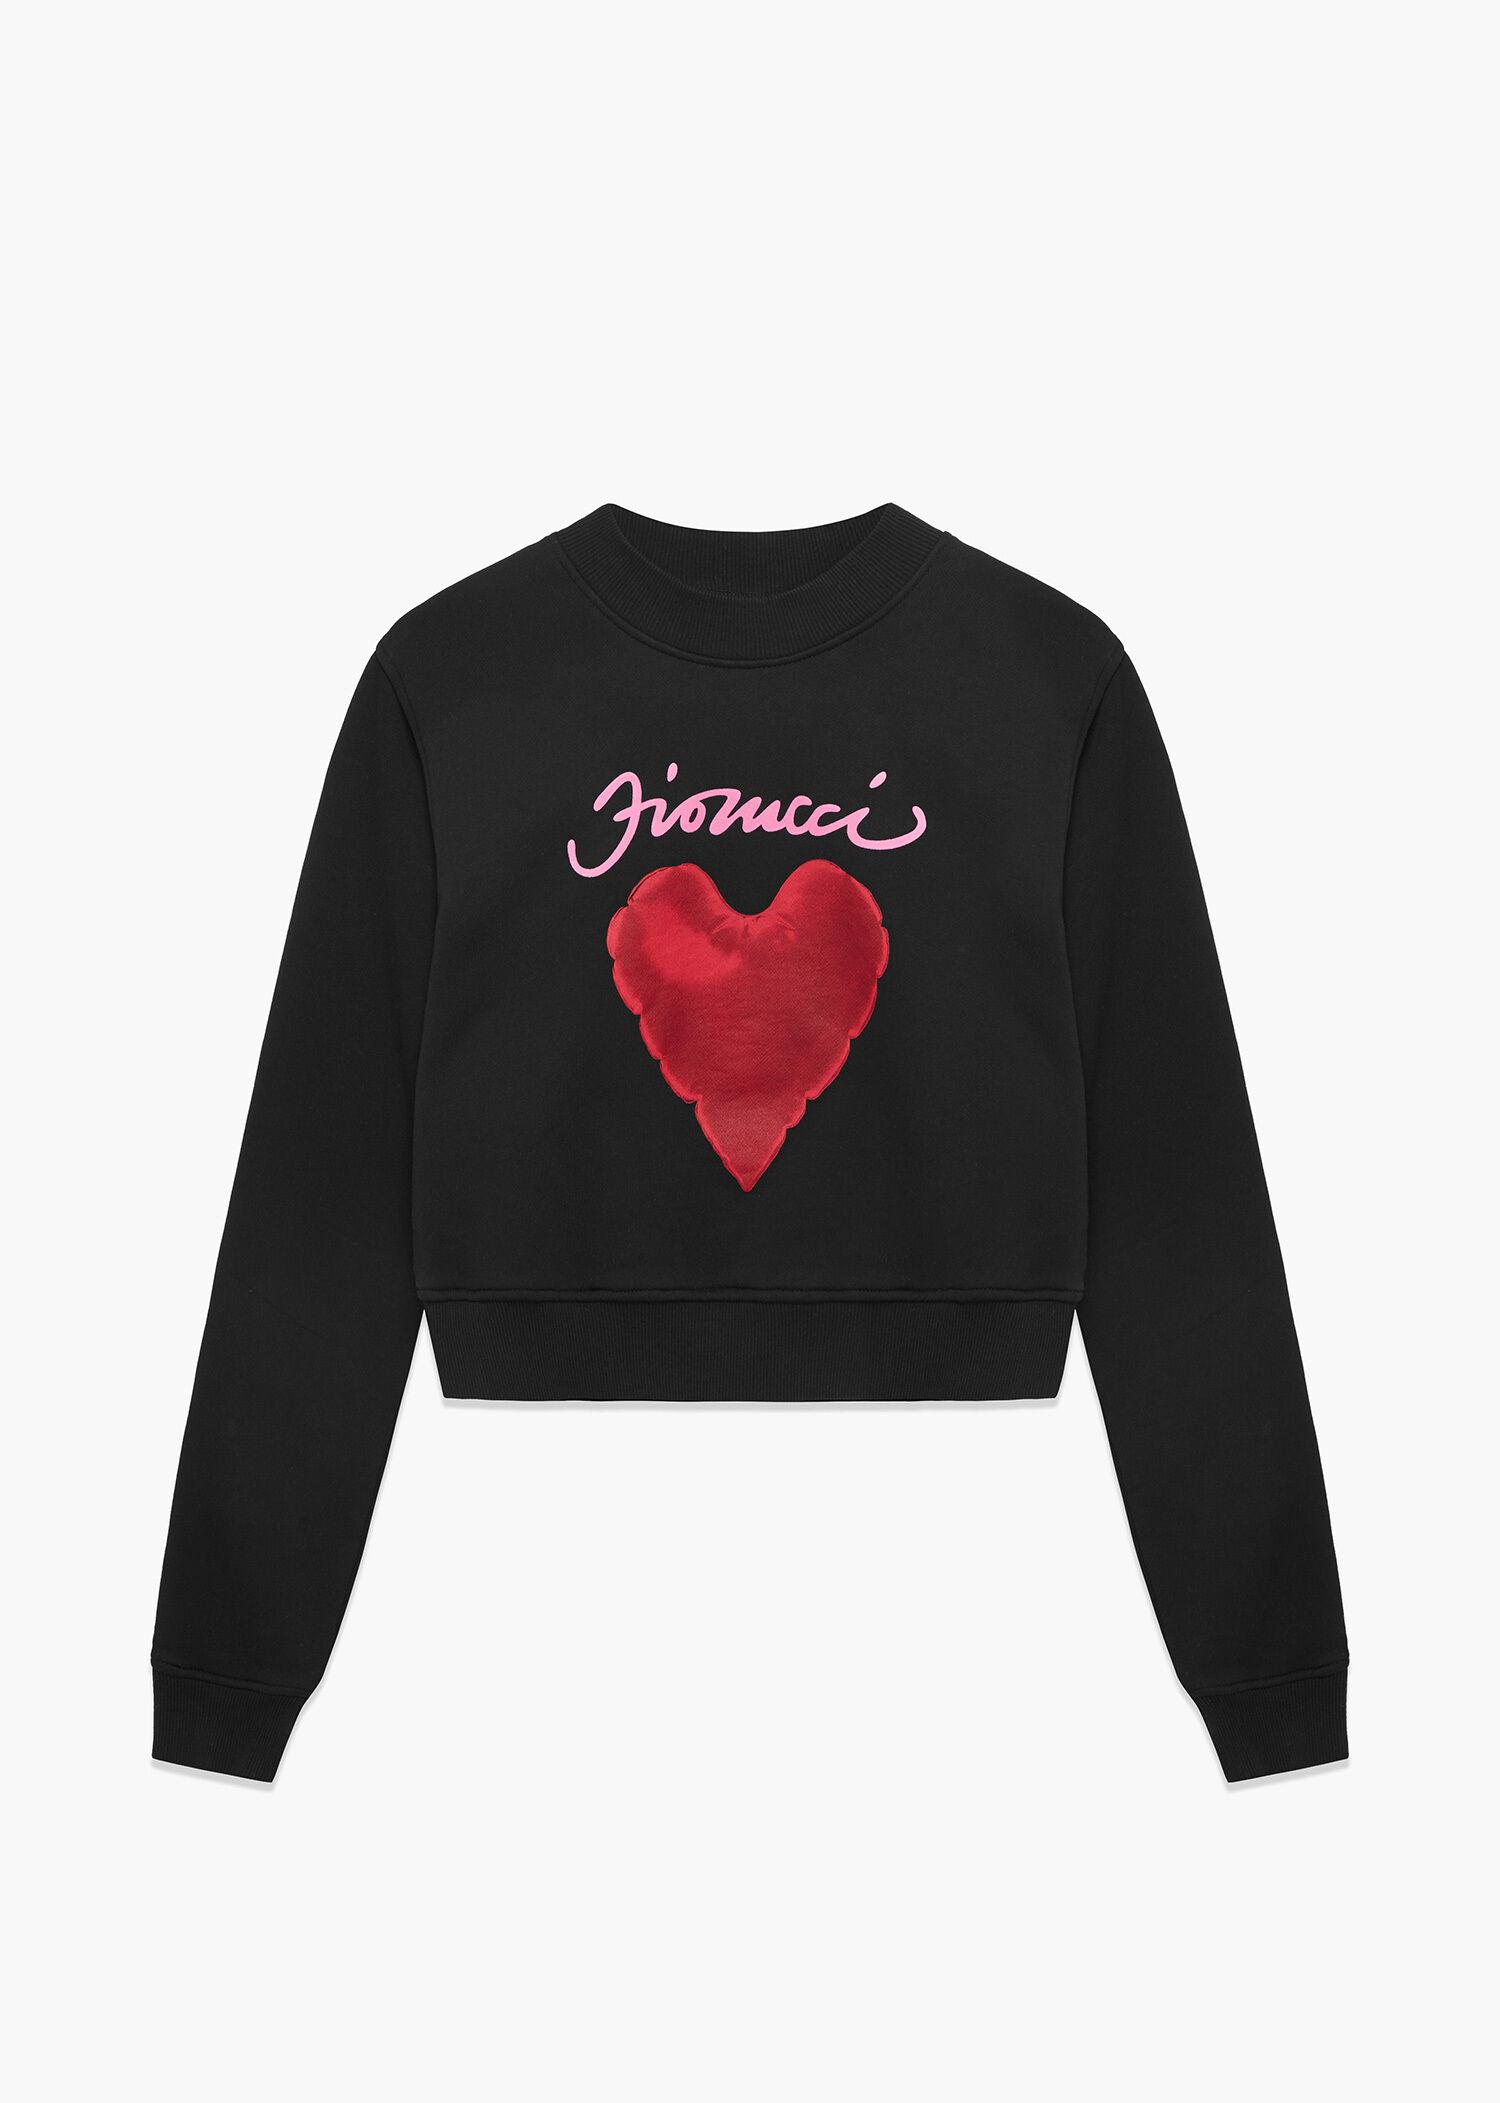 I Love Heart United Kingdom Black Sweatshirt